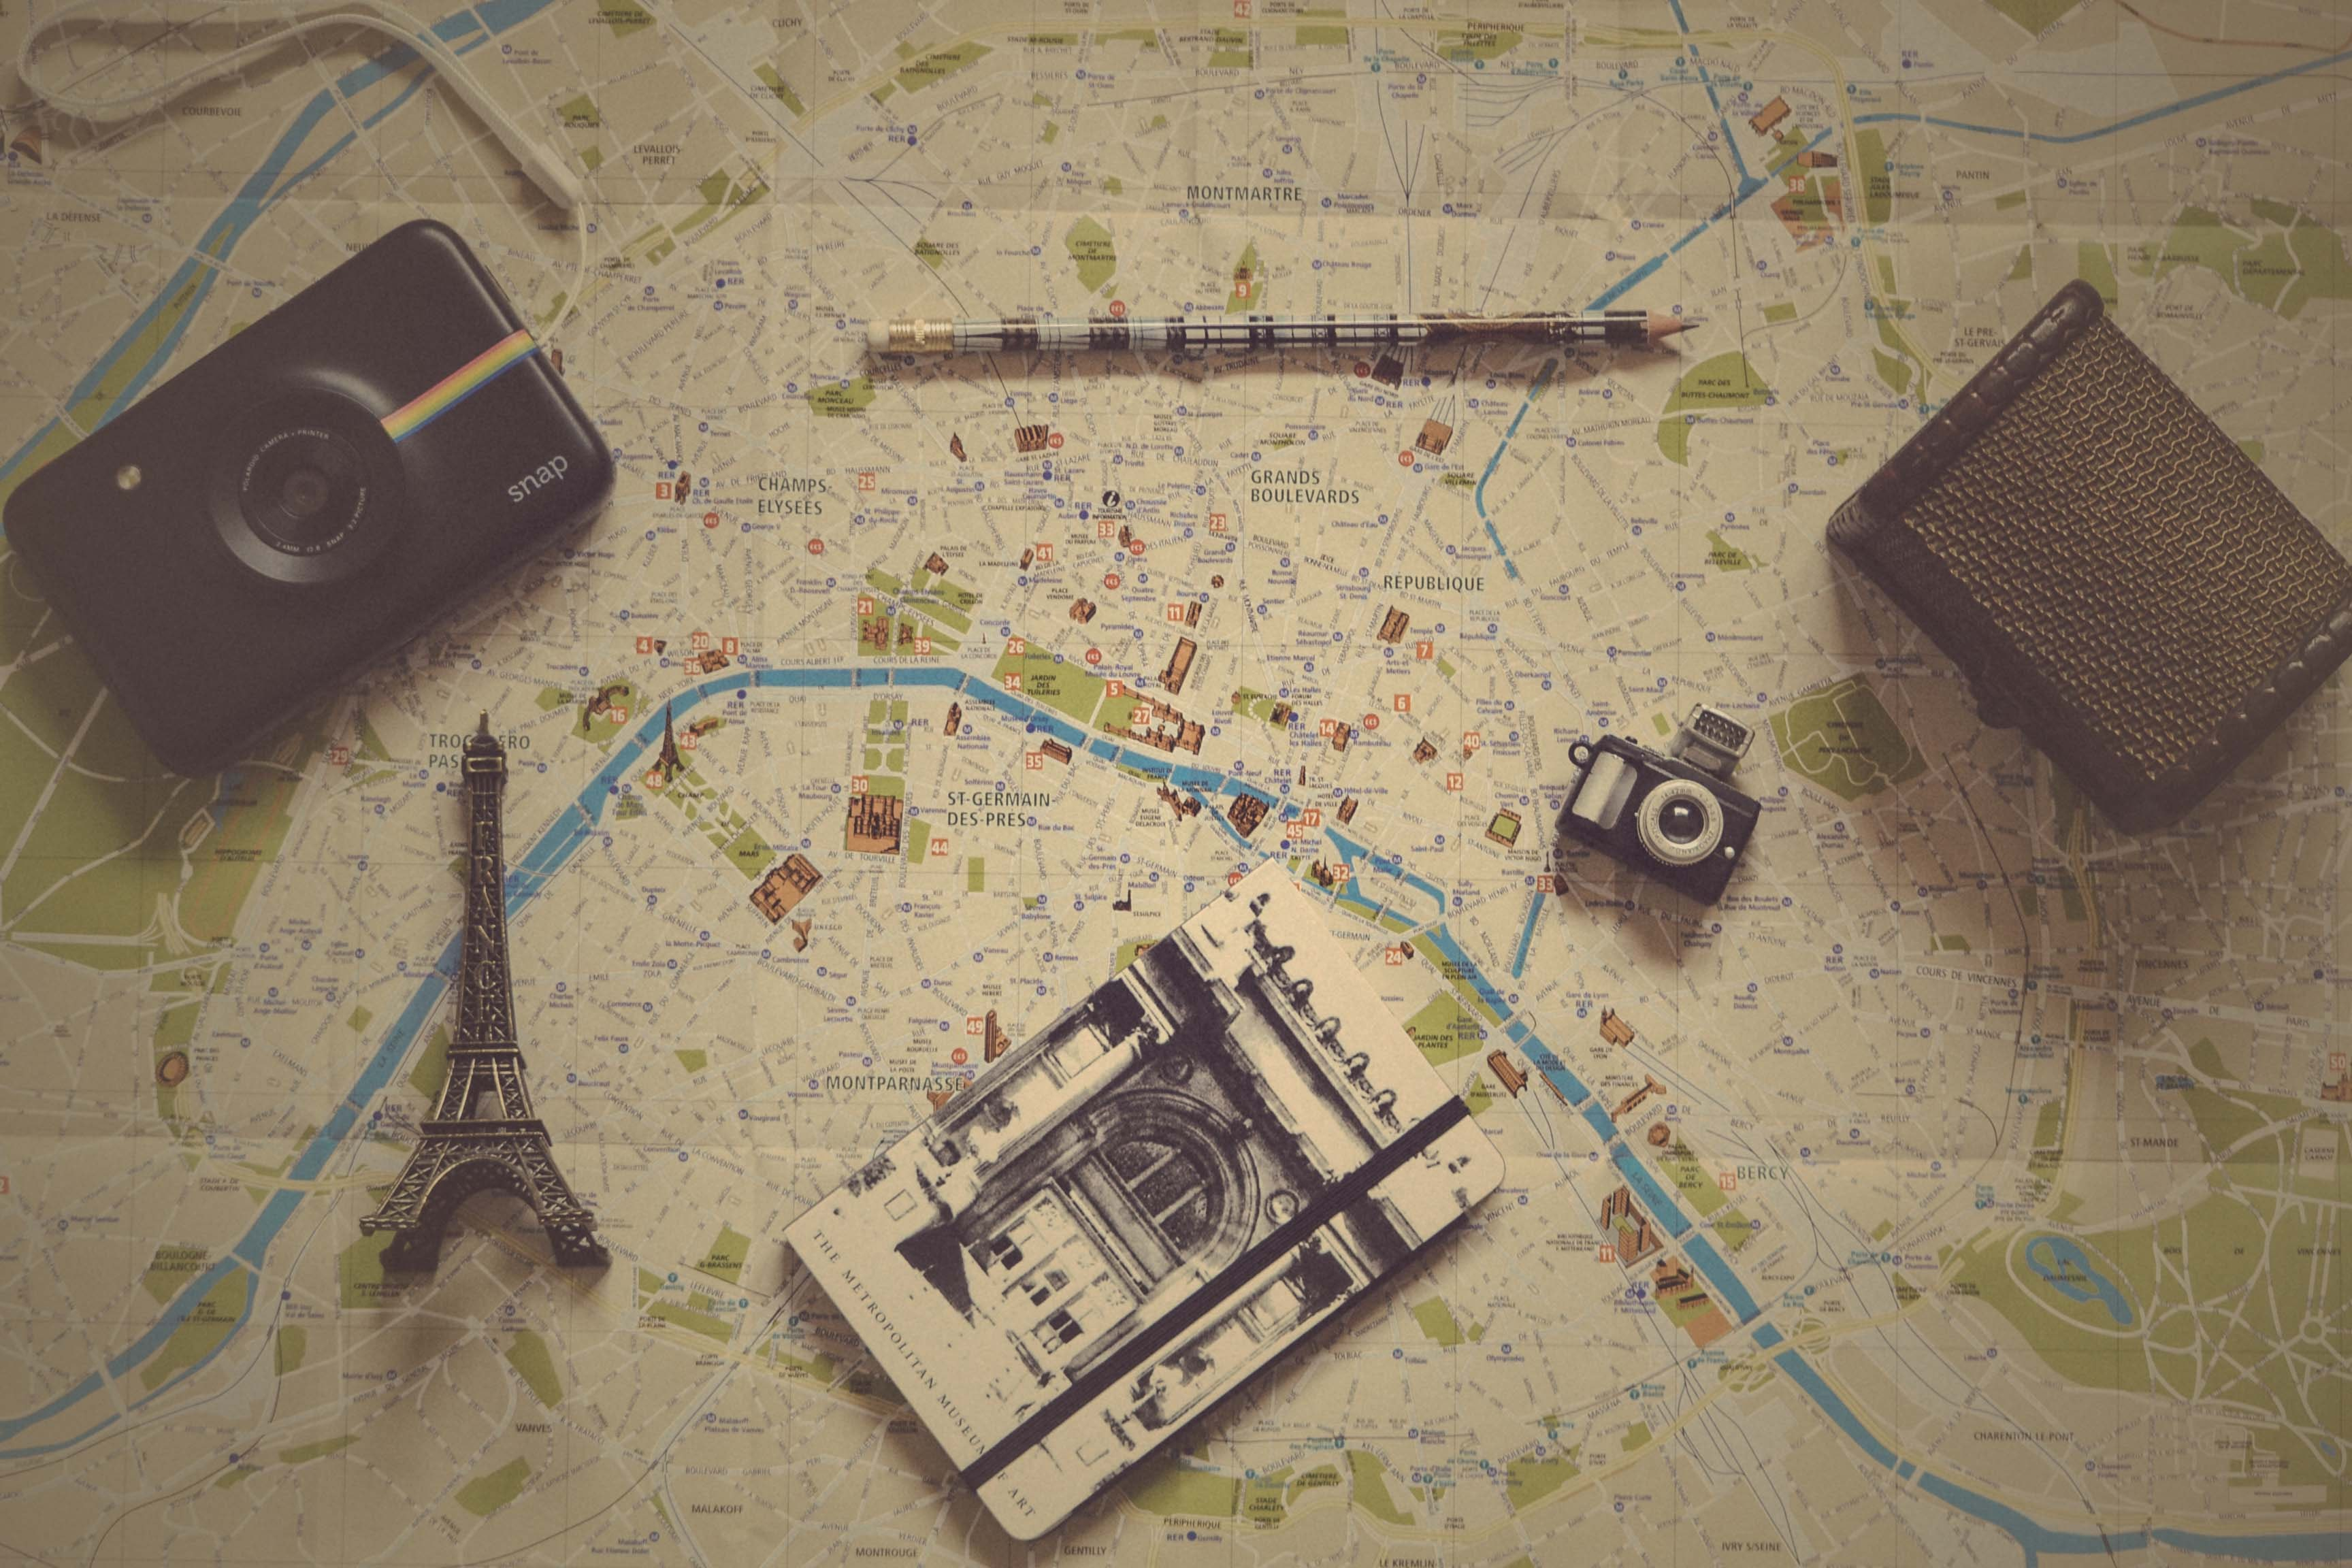 black camera near gray metal Eiffel tower figurine